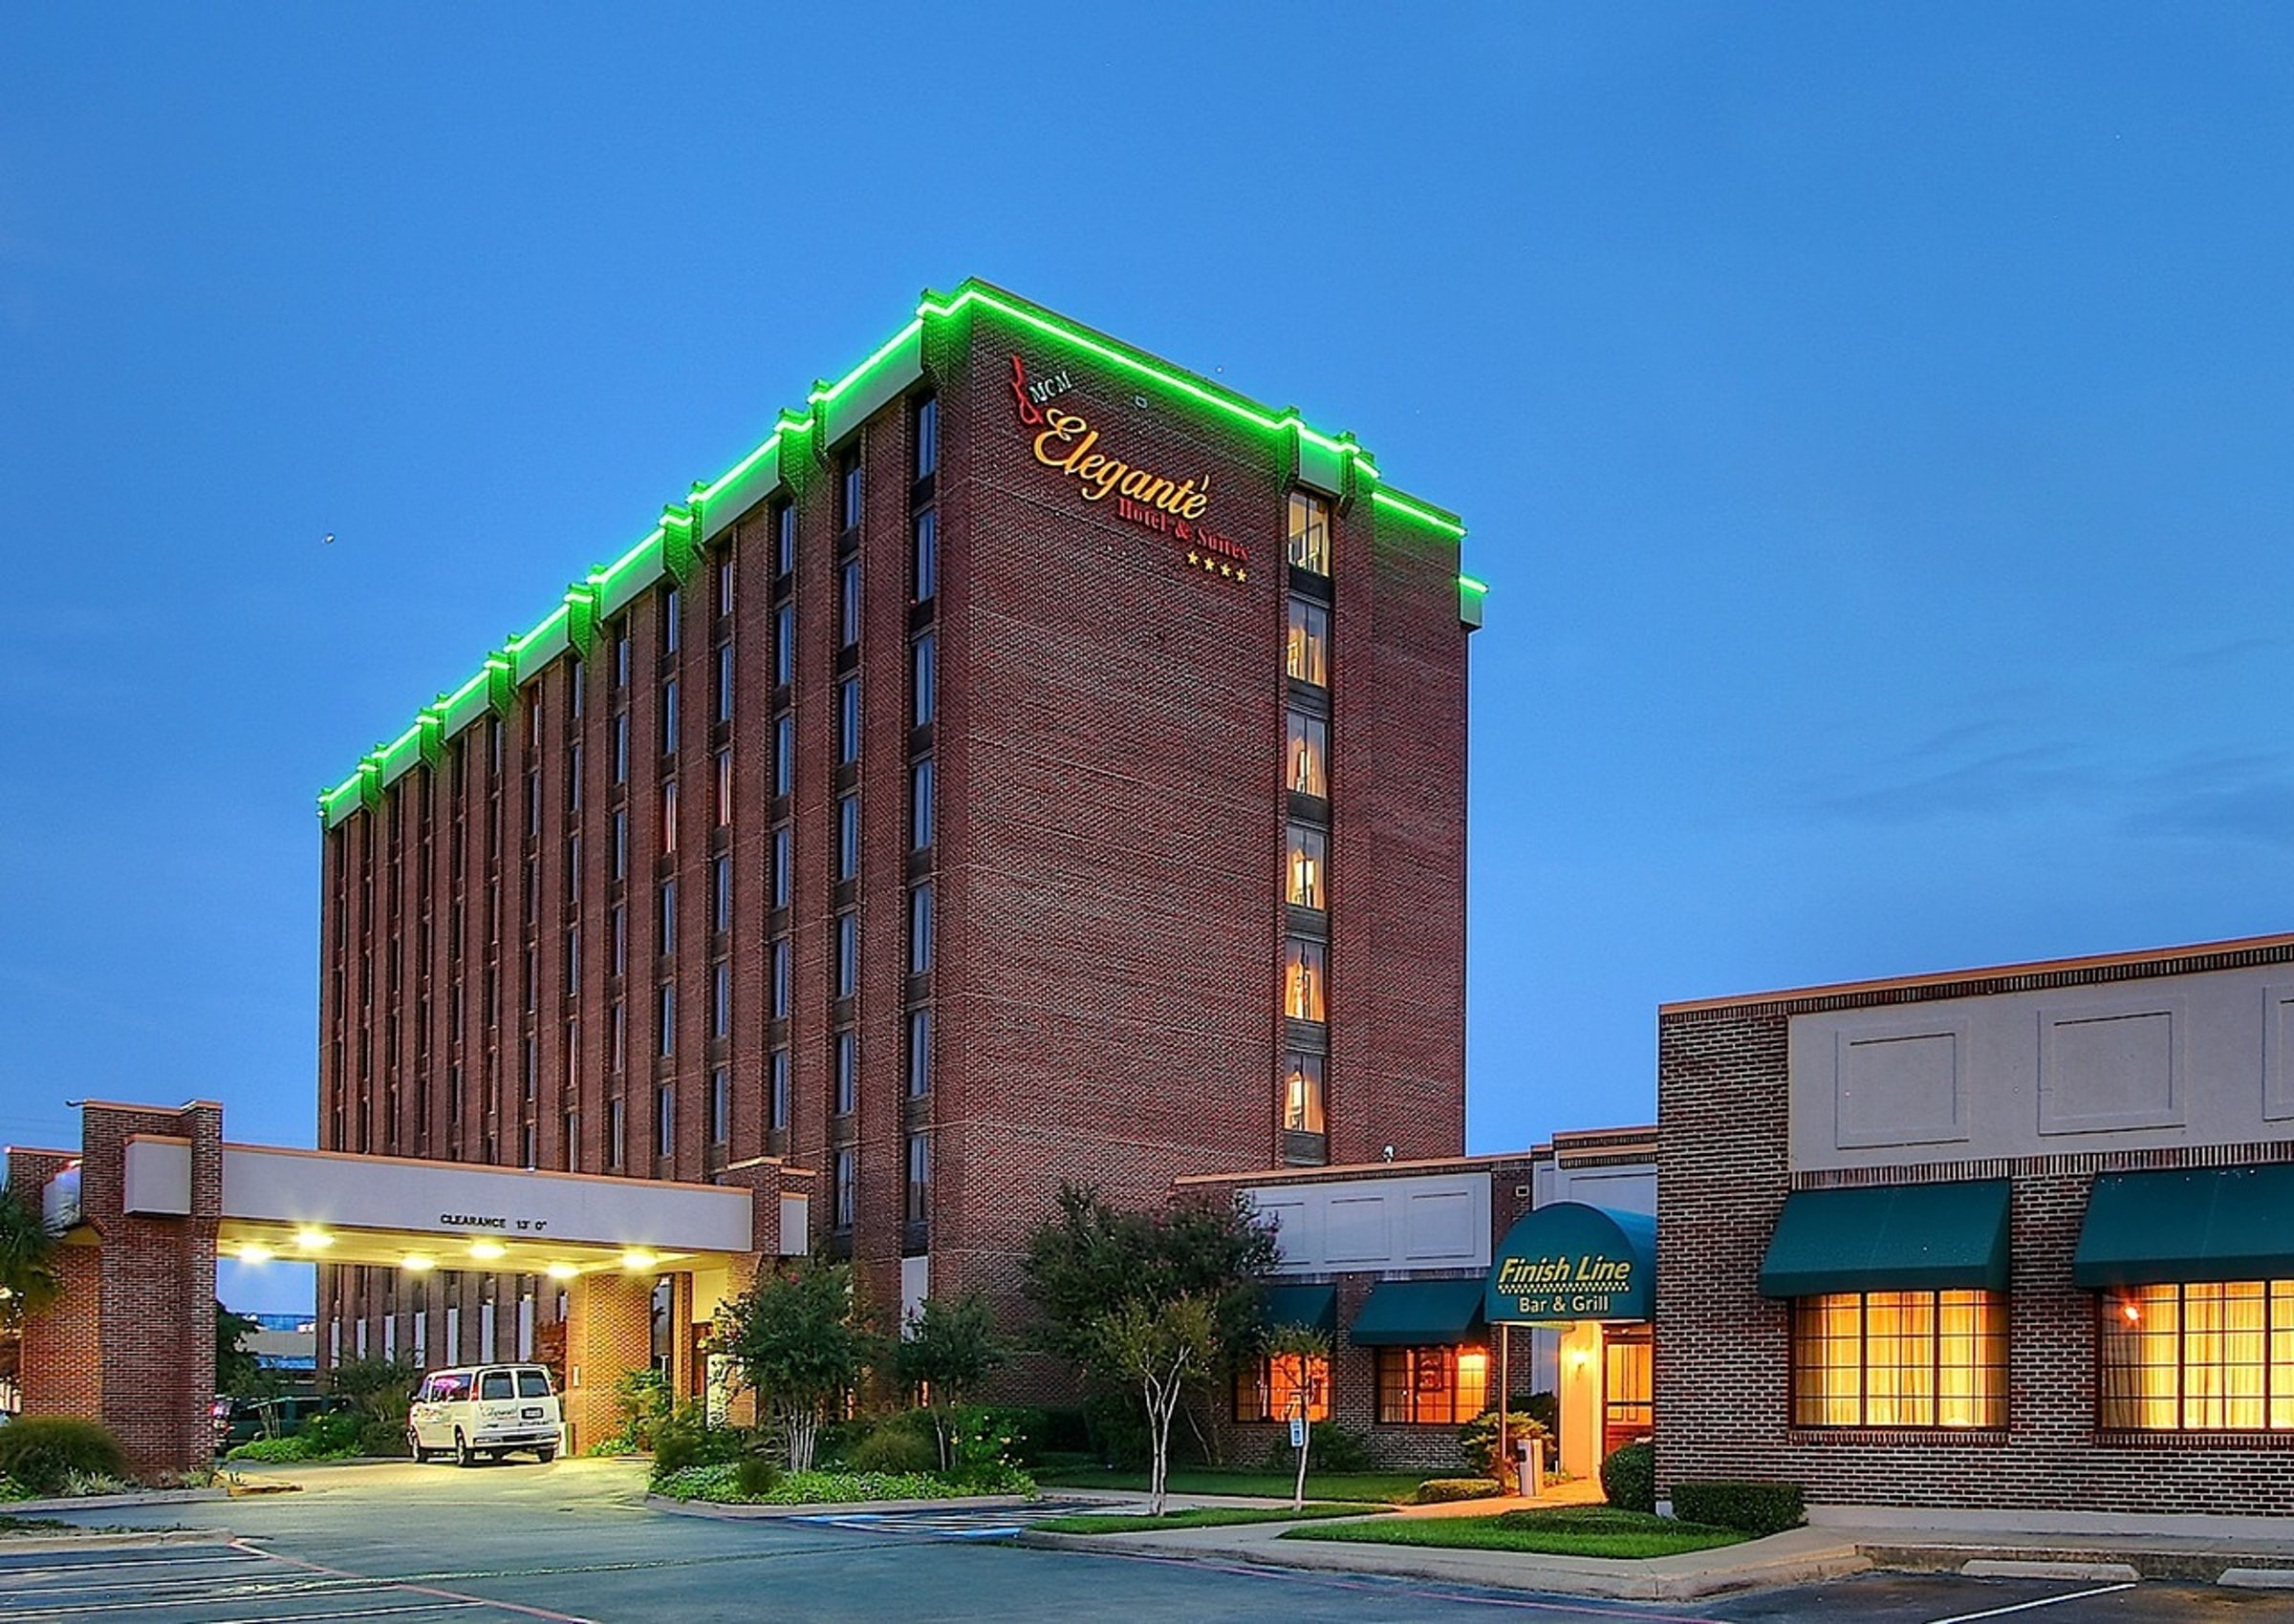 MCM Elegante Hotel & Suites in Beyond Dallas